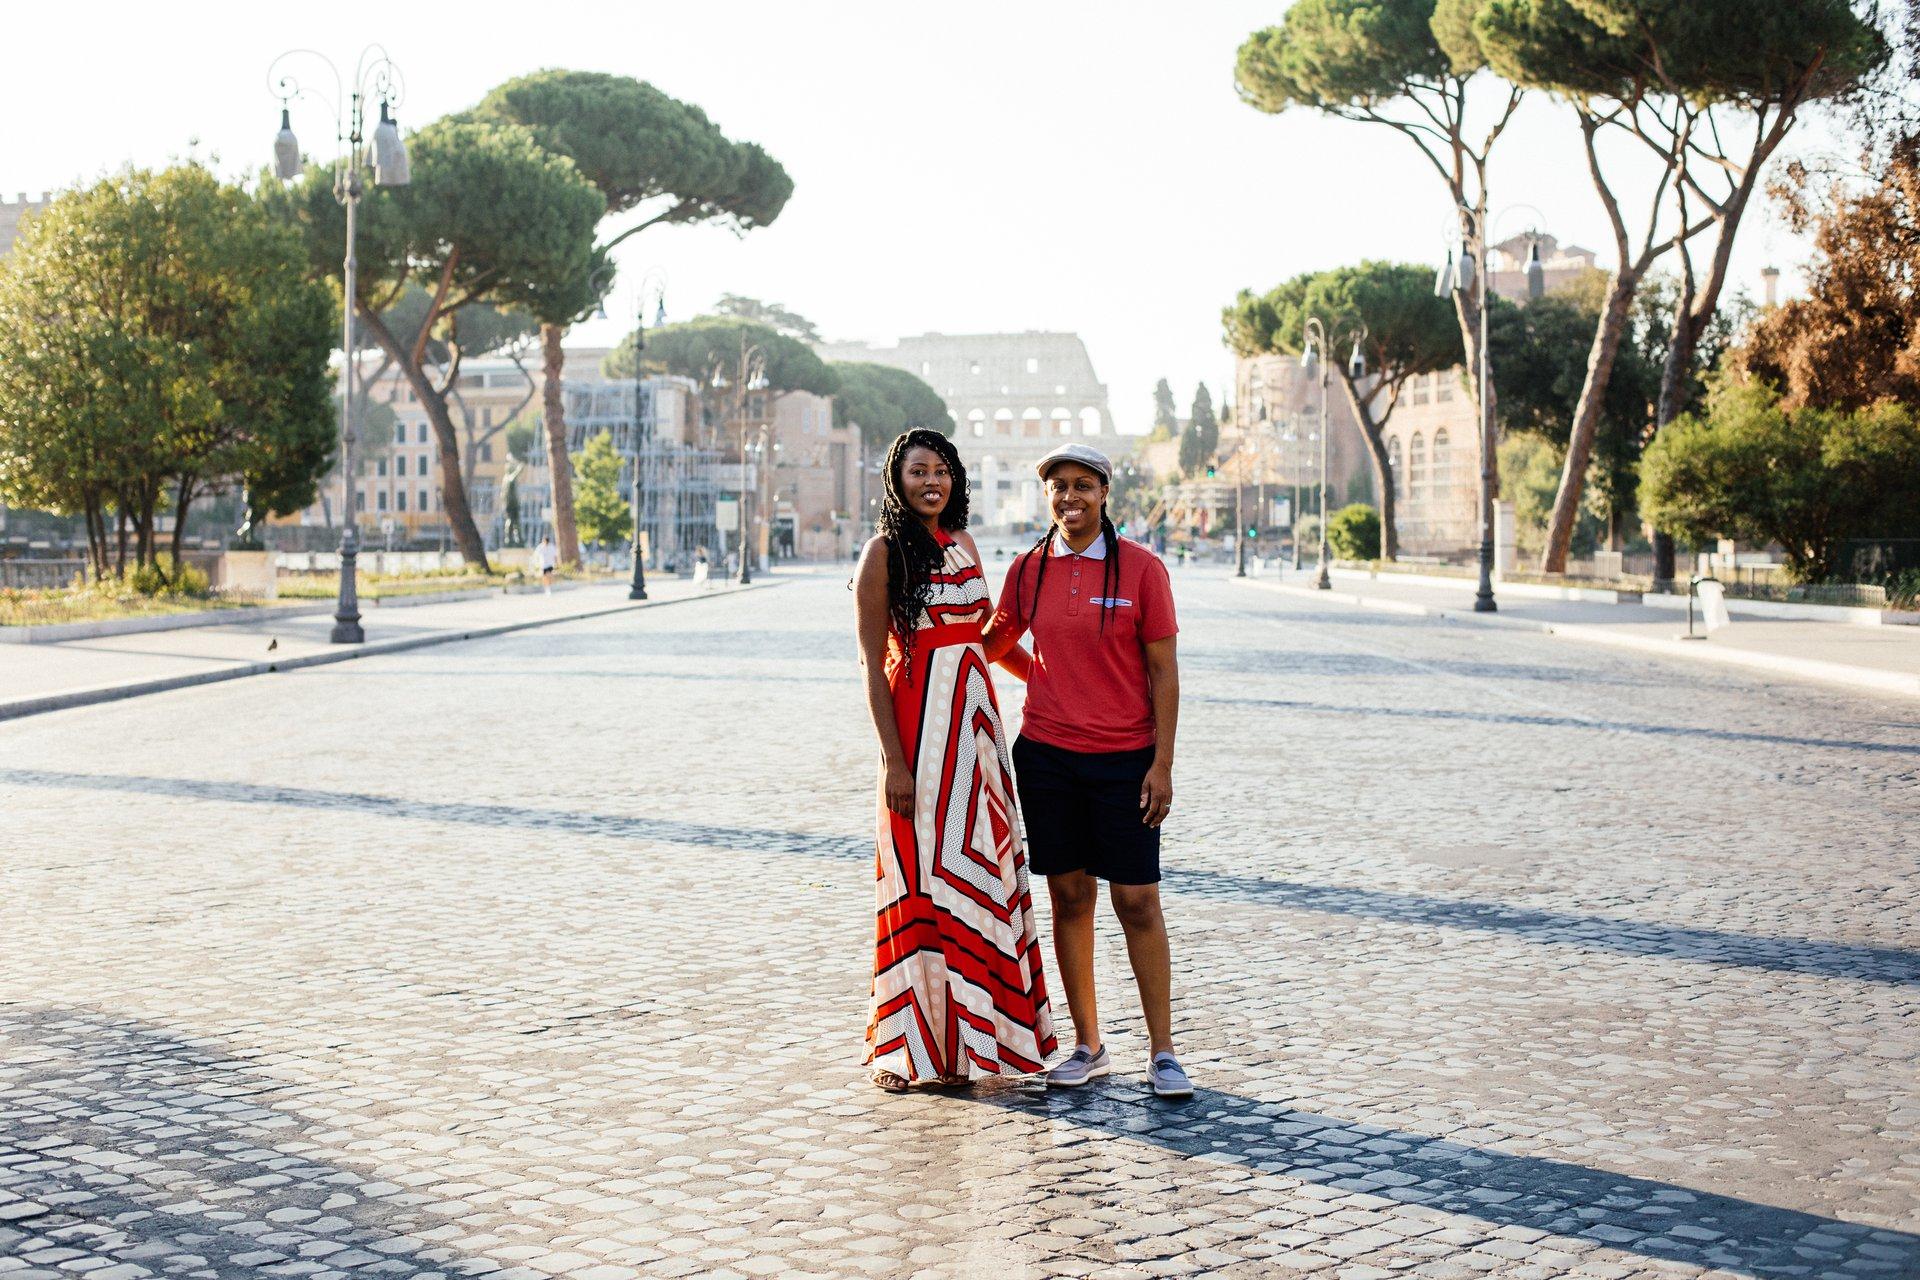 Rome-Italy-travel-story-Flytographer-16